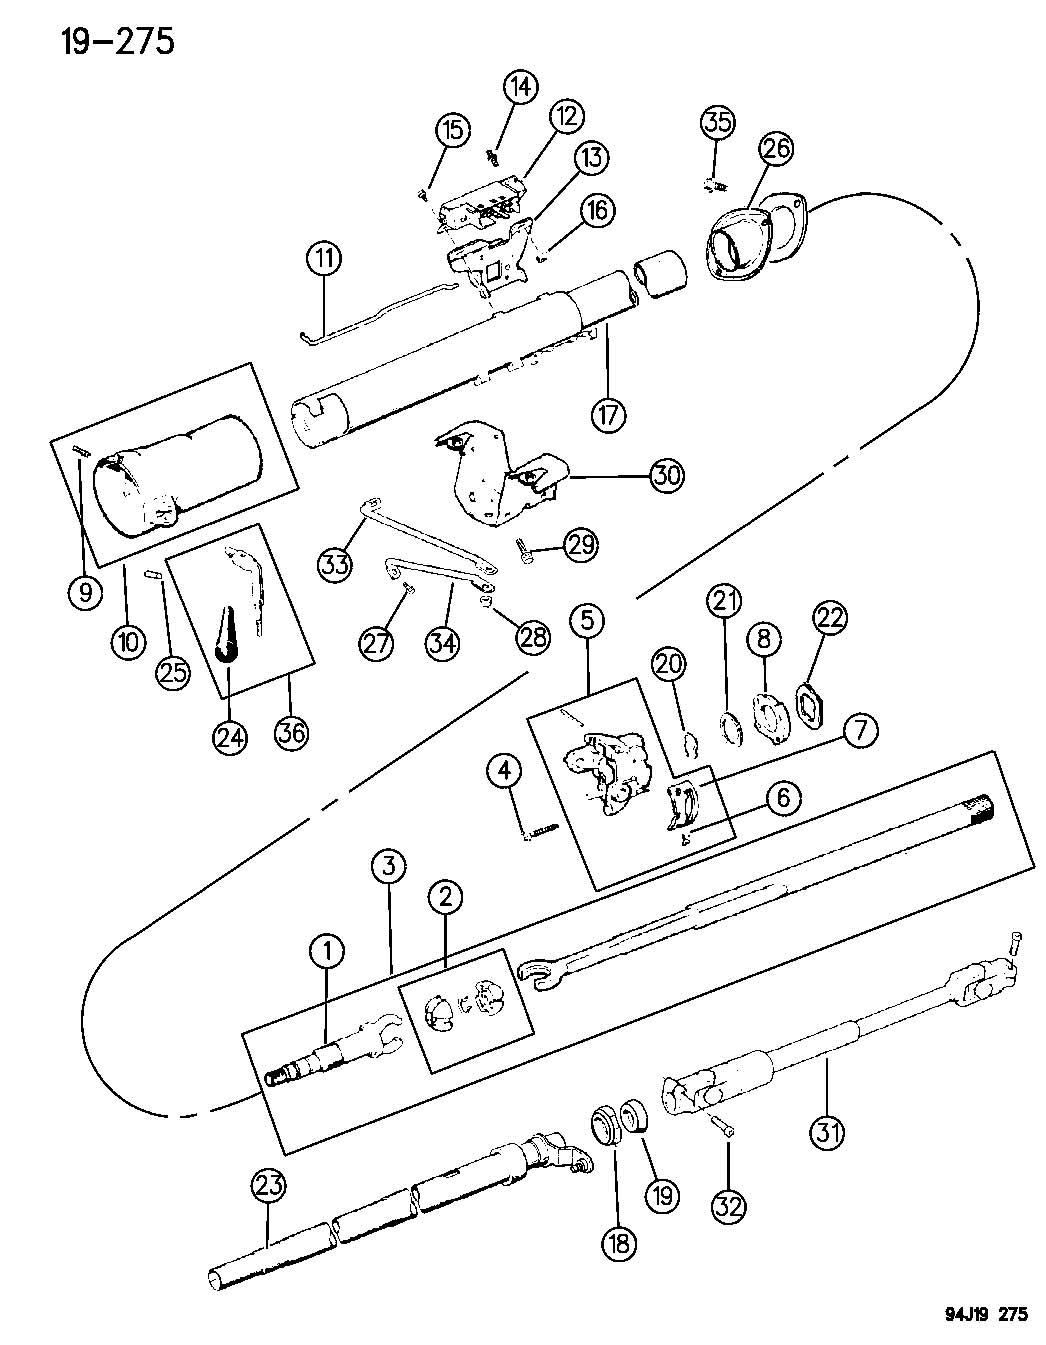 service manual 2012 acura rdx wiring diagram pdf